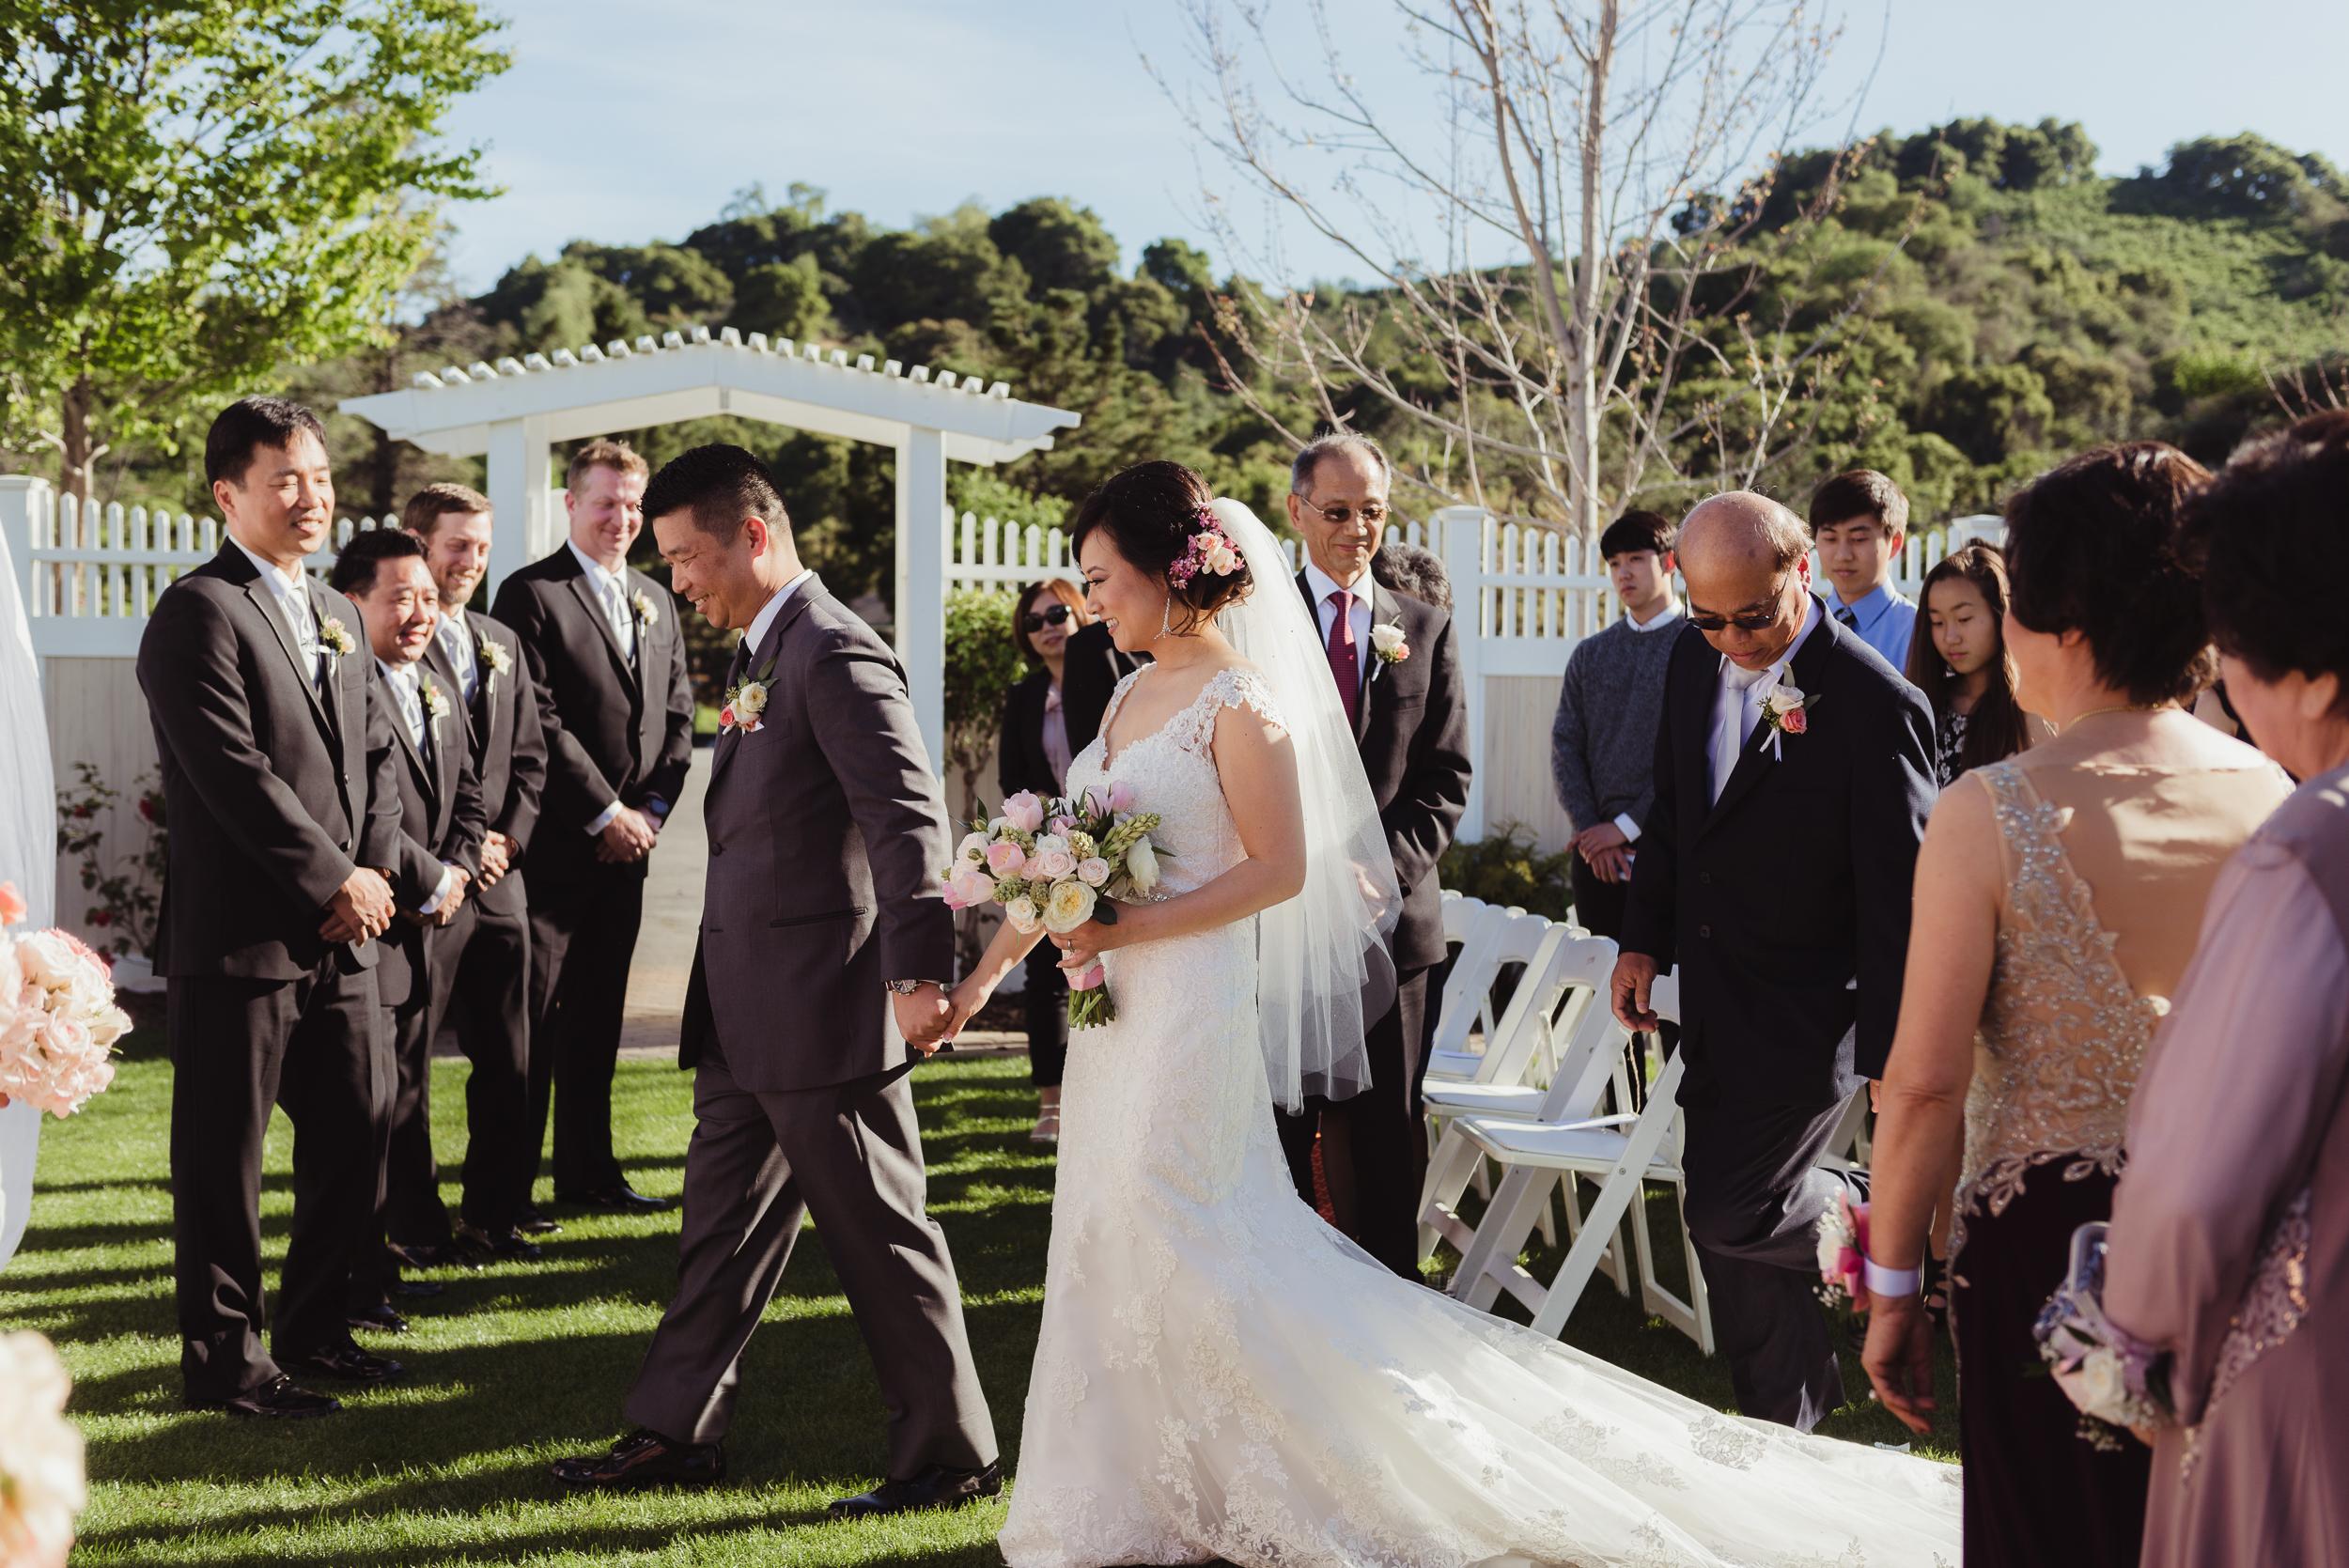 17-saratoga-country-club-wedding-vivianchen-216.jpg